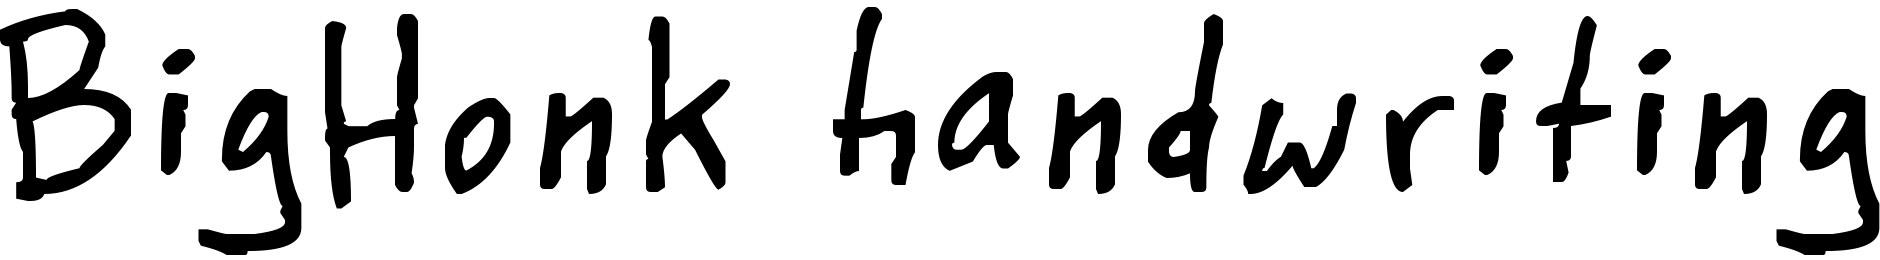 BigHonk handwriting